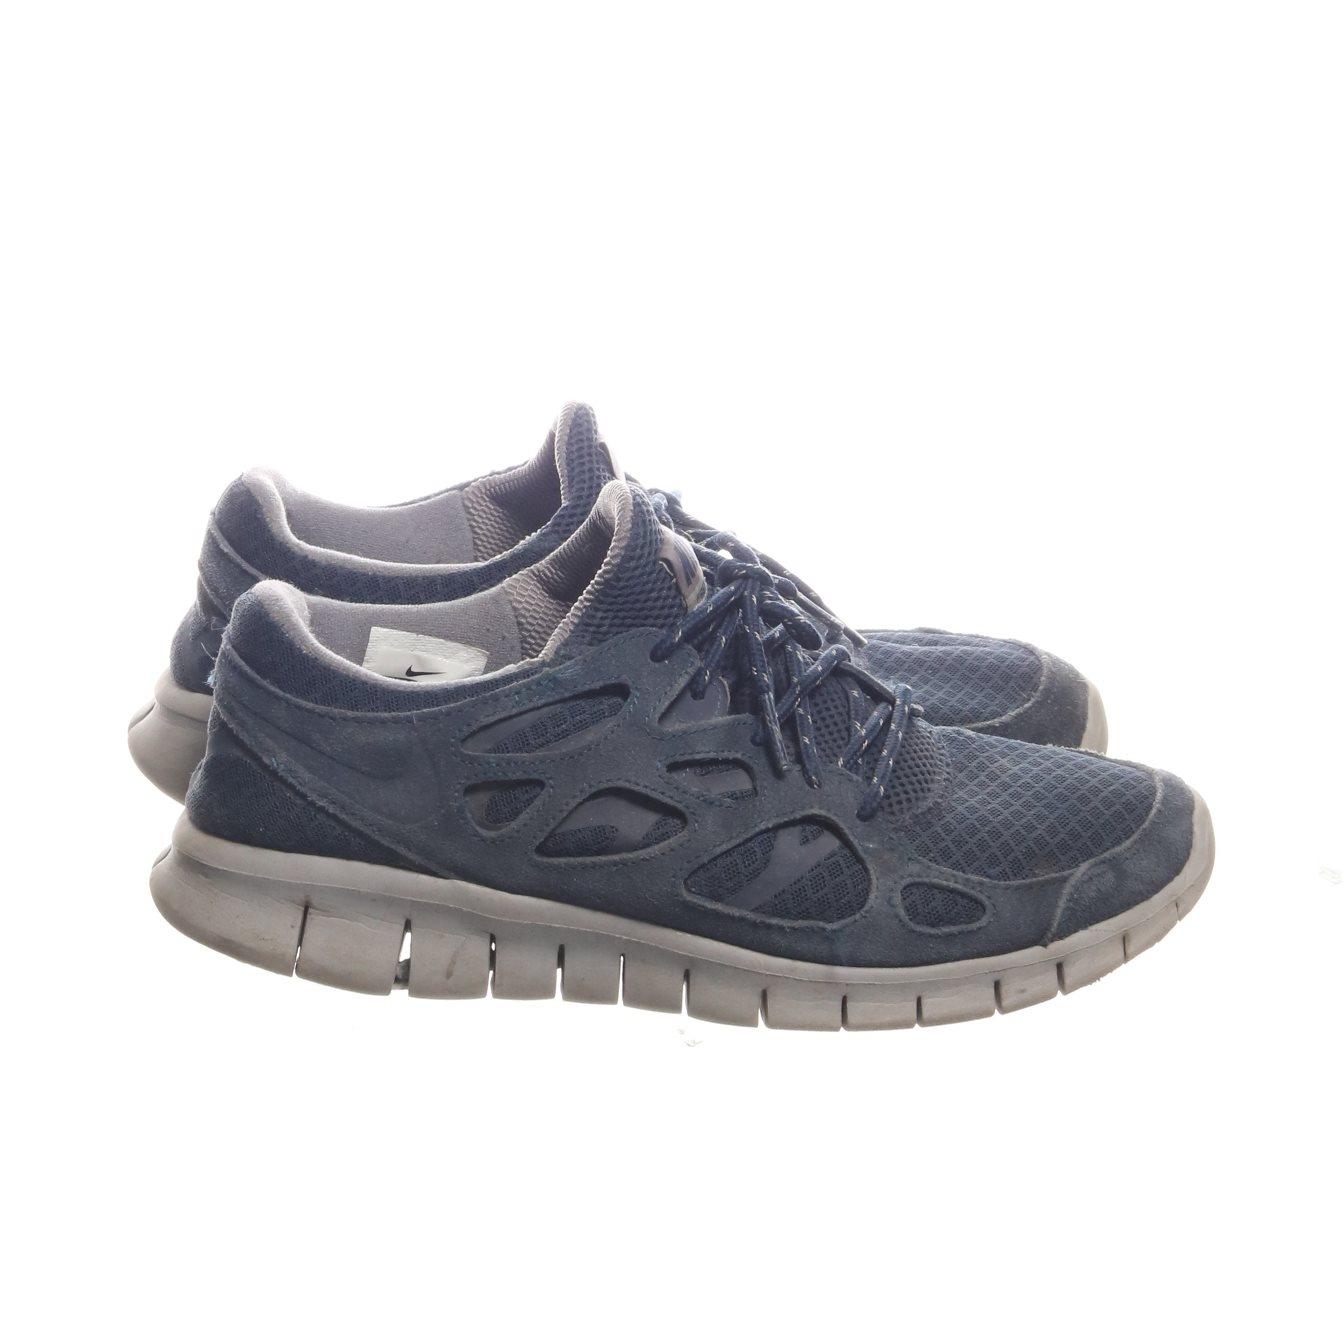 sports shoes ad0d9 956b2 Nike, Sneakers, Strl  44, Free Run 2, Blå